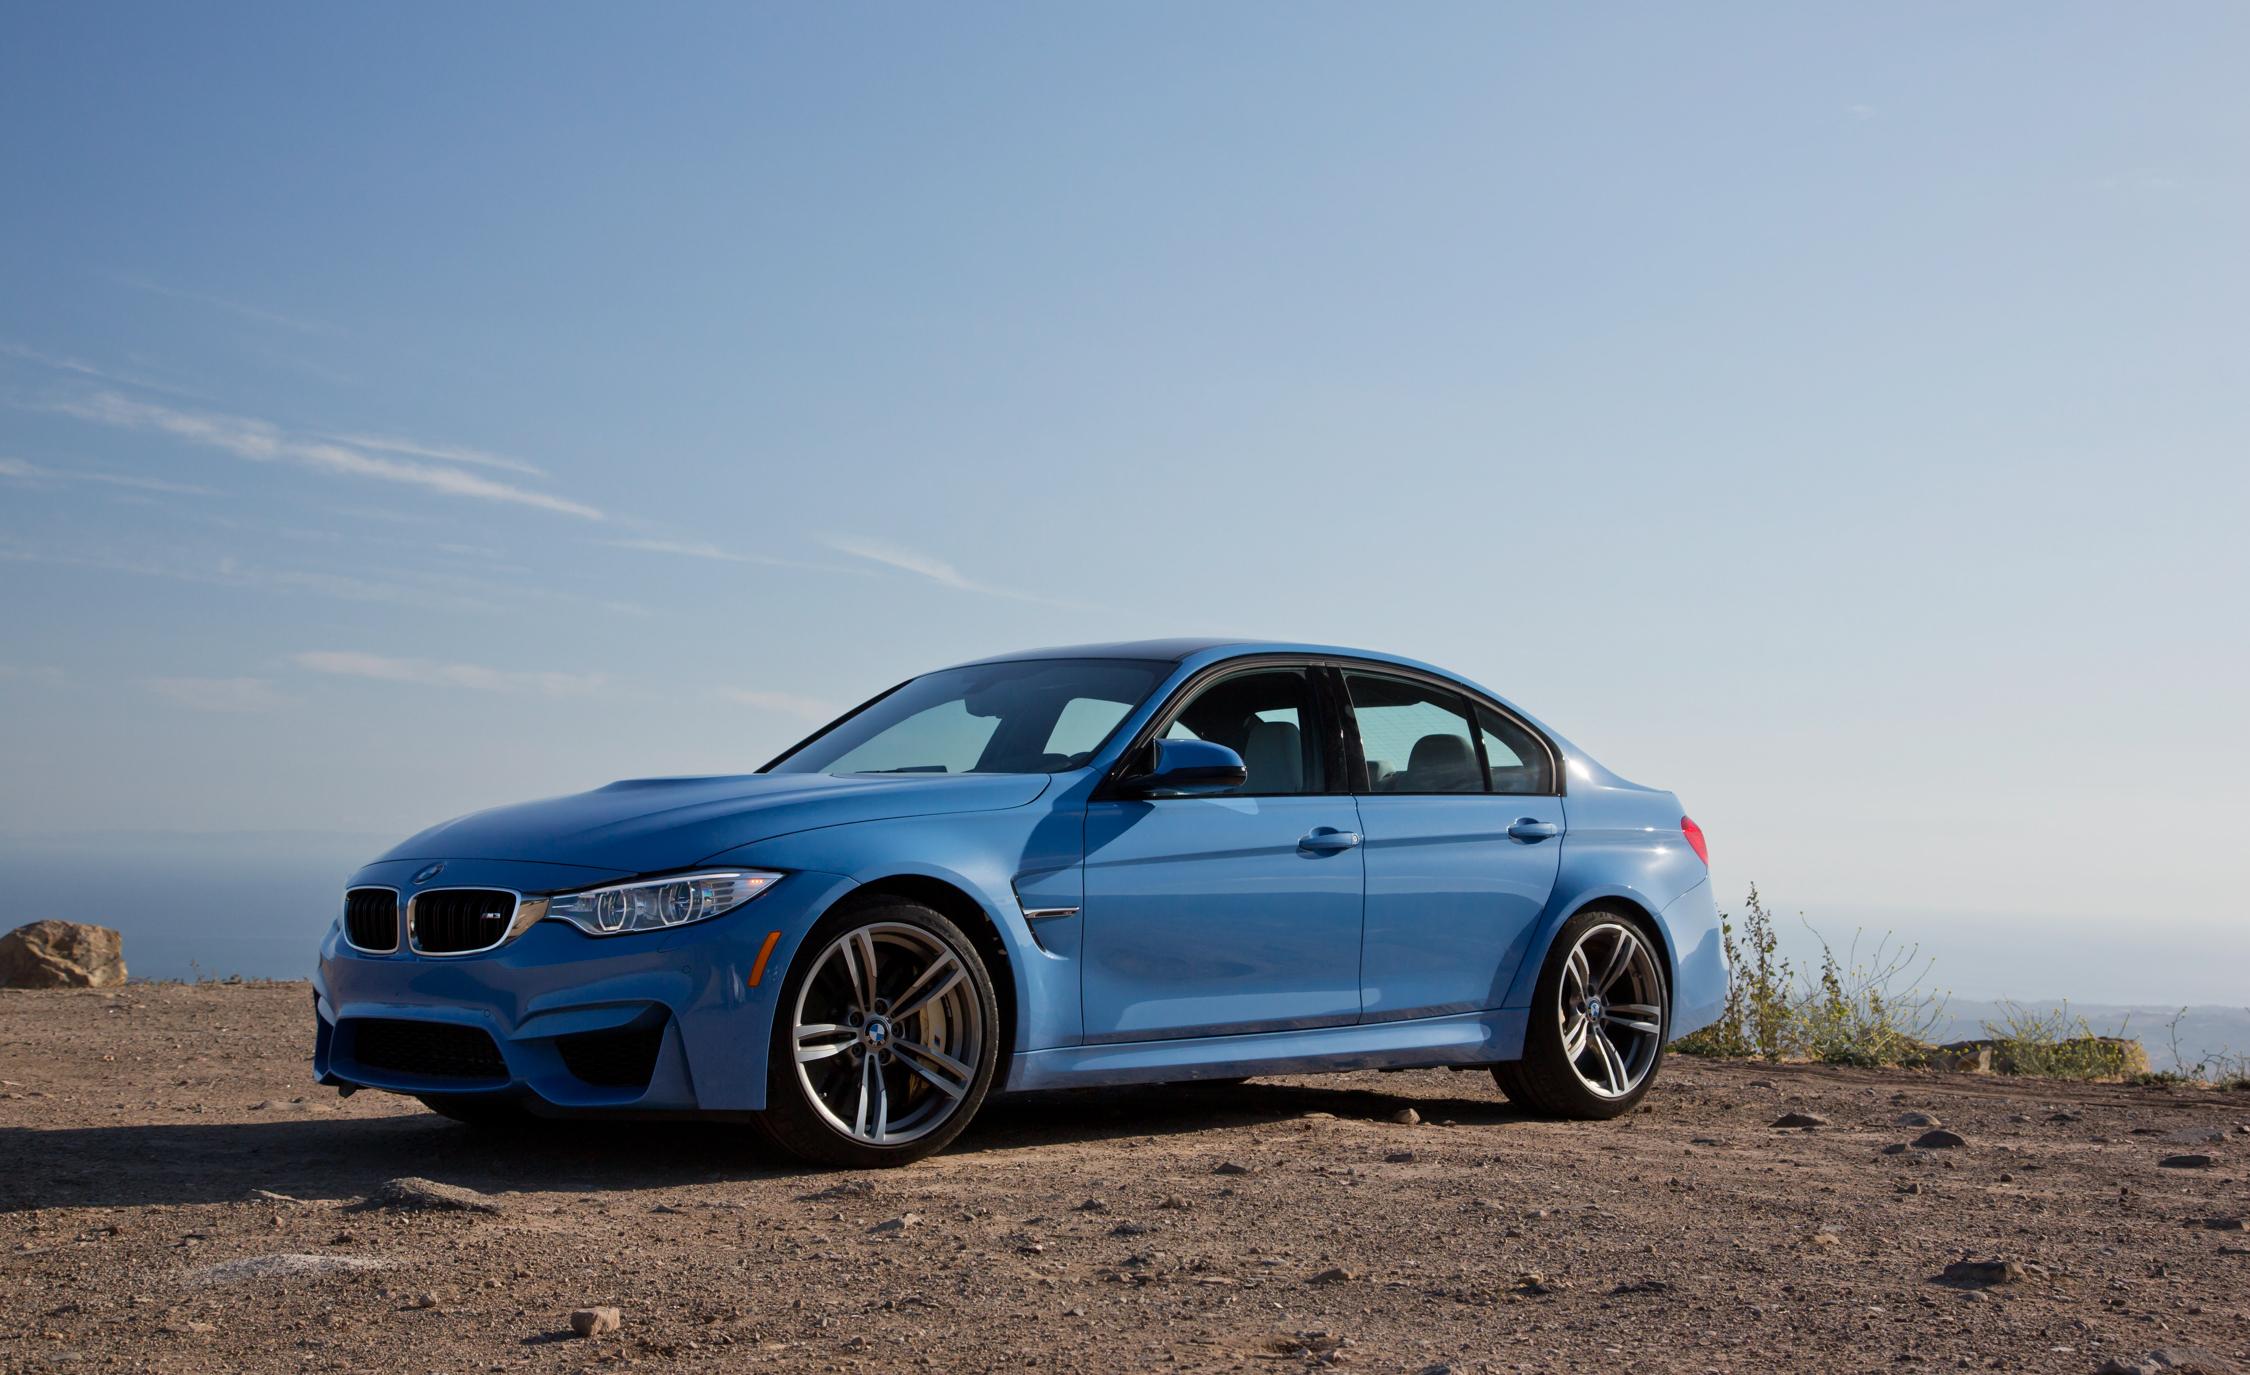 2015 BMW M3 Sedan Exterior Overview